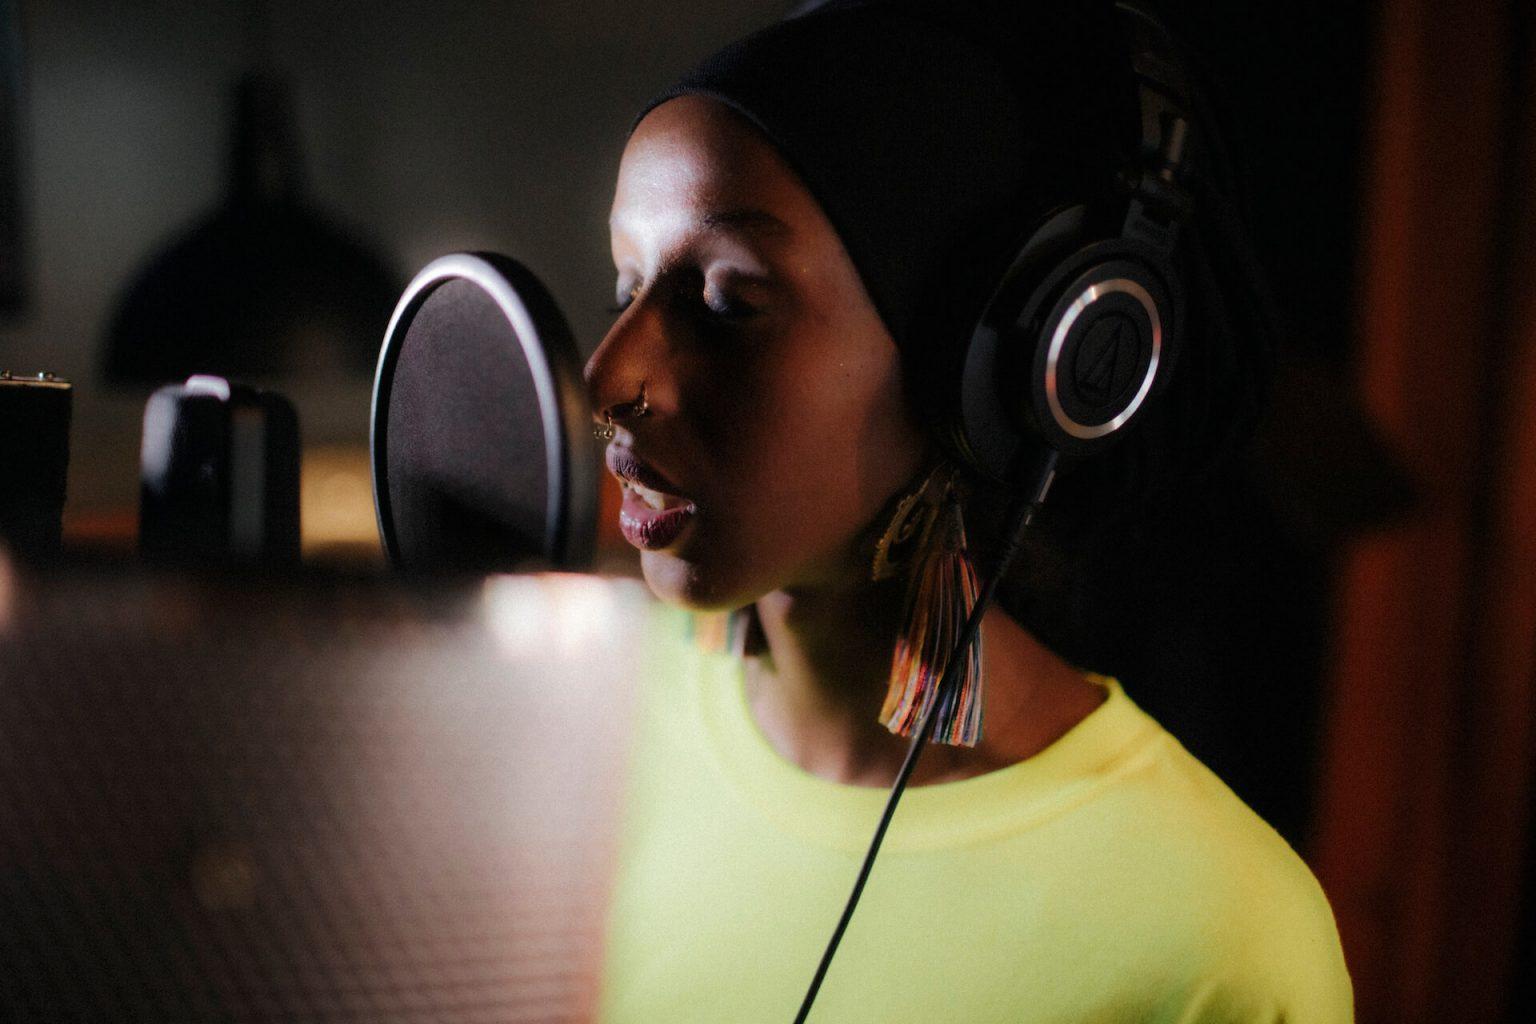 Copy-of-ESP-Nariobi-2019-Dan-Medhurst-1721-1440x960 即興と融合。英国・ケニア・ウガンダ8人の伝統と才能が交わるサウンドプロジェクト。ソウルミュージック未聴の領域へ「ESP」